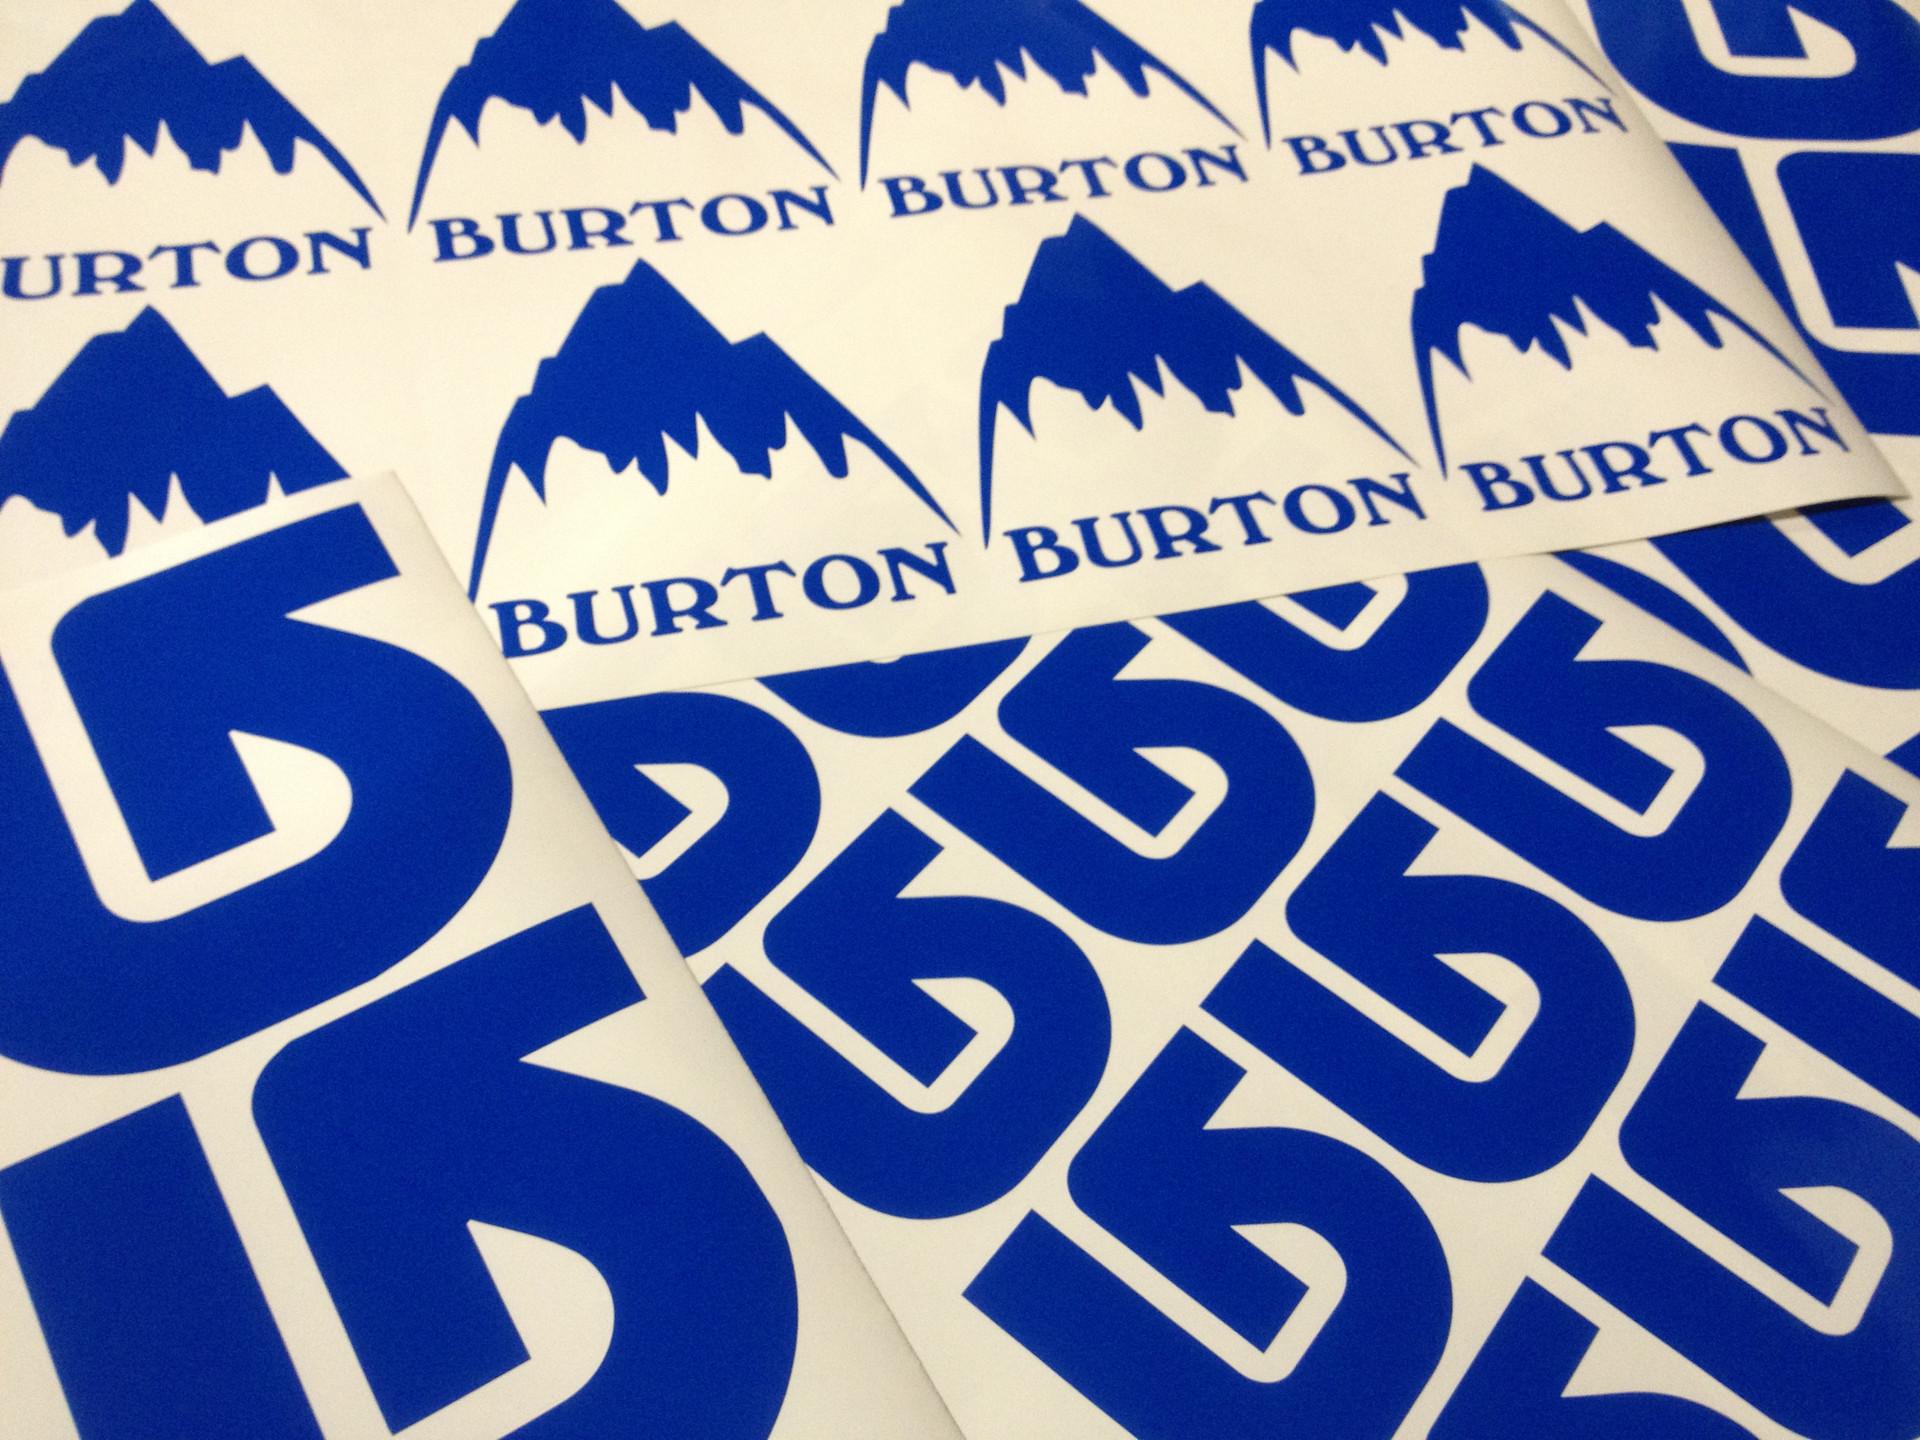 BurtonSticksRd2.JPG